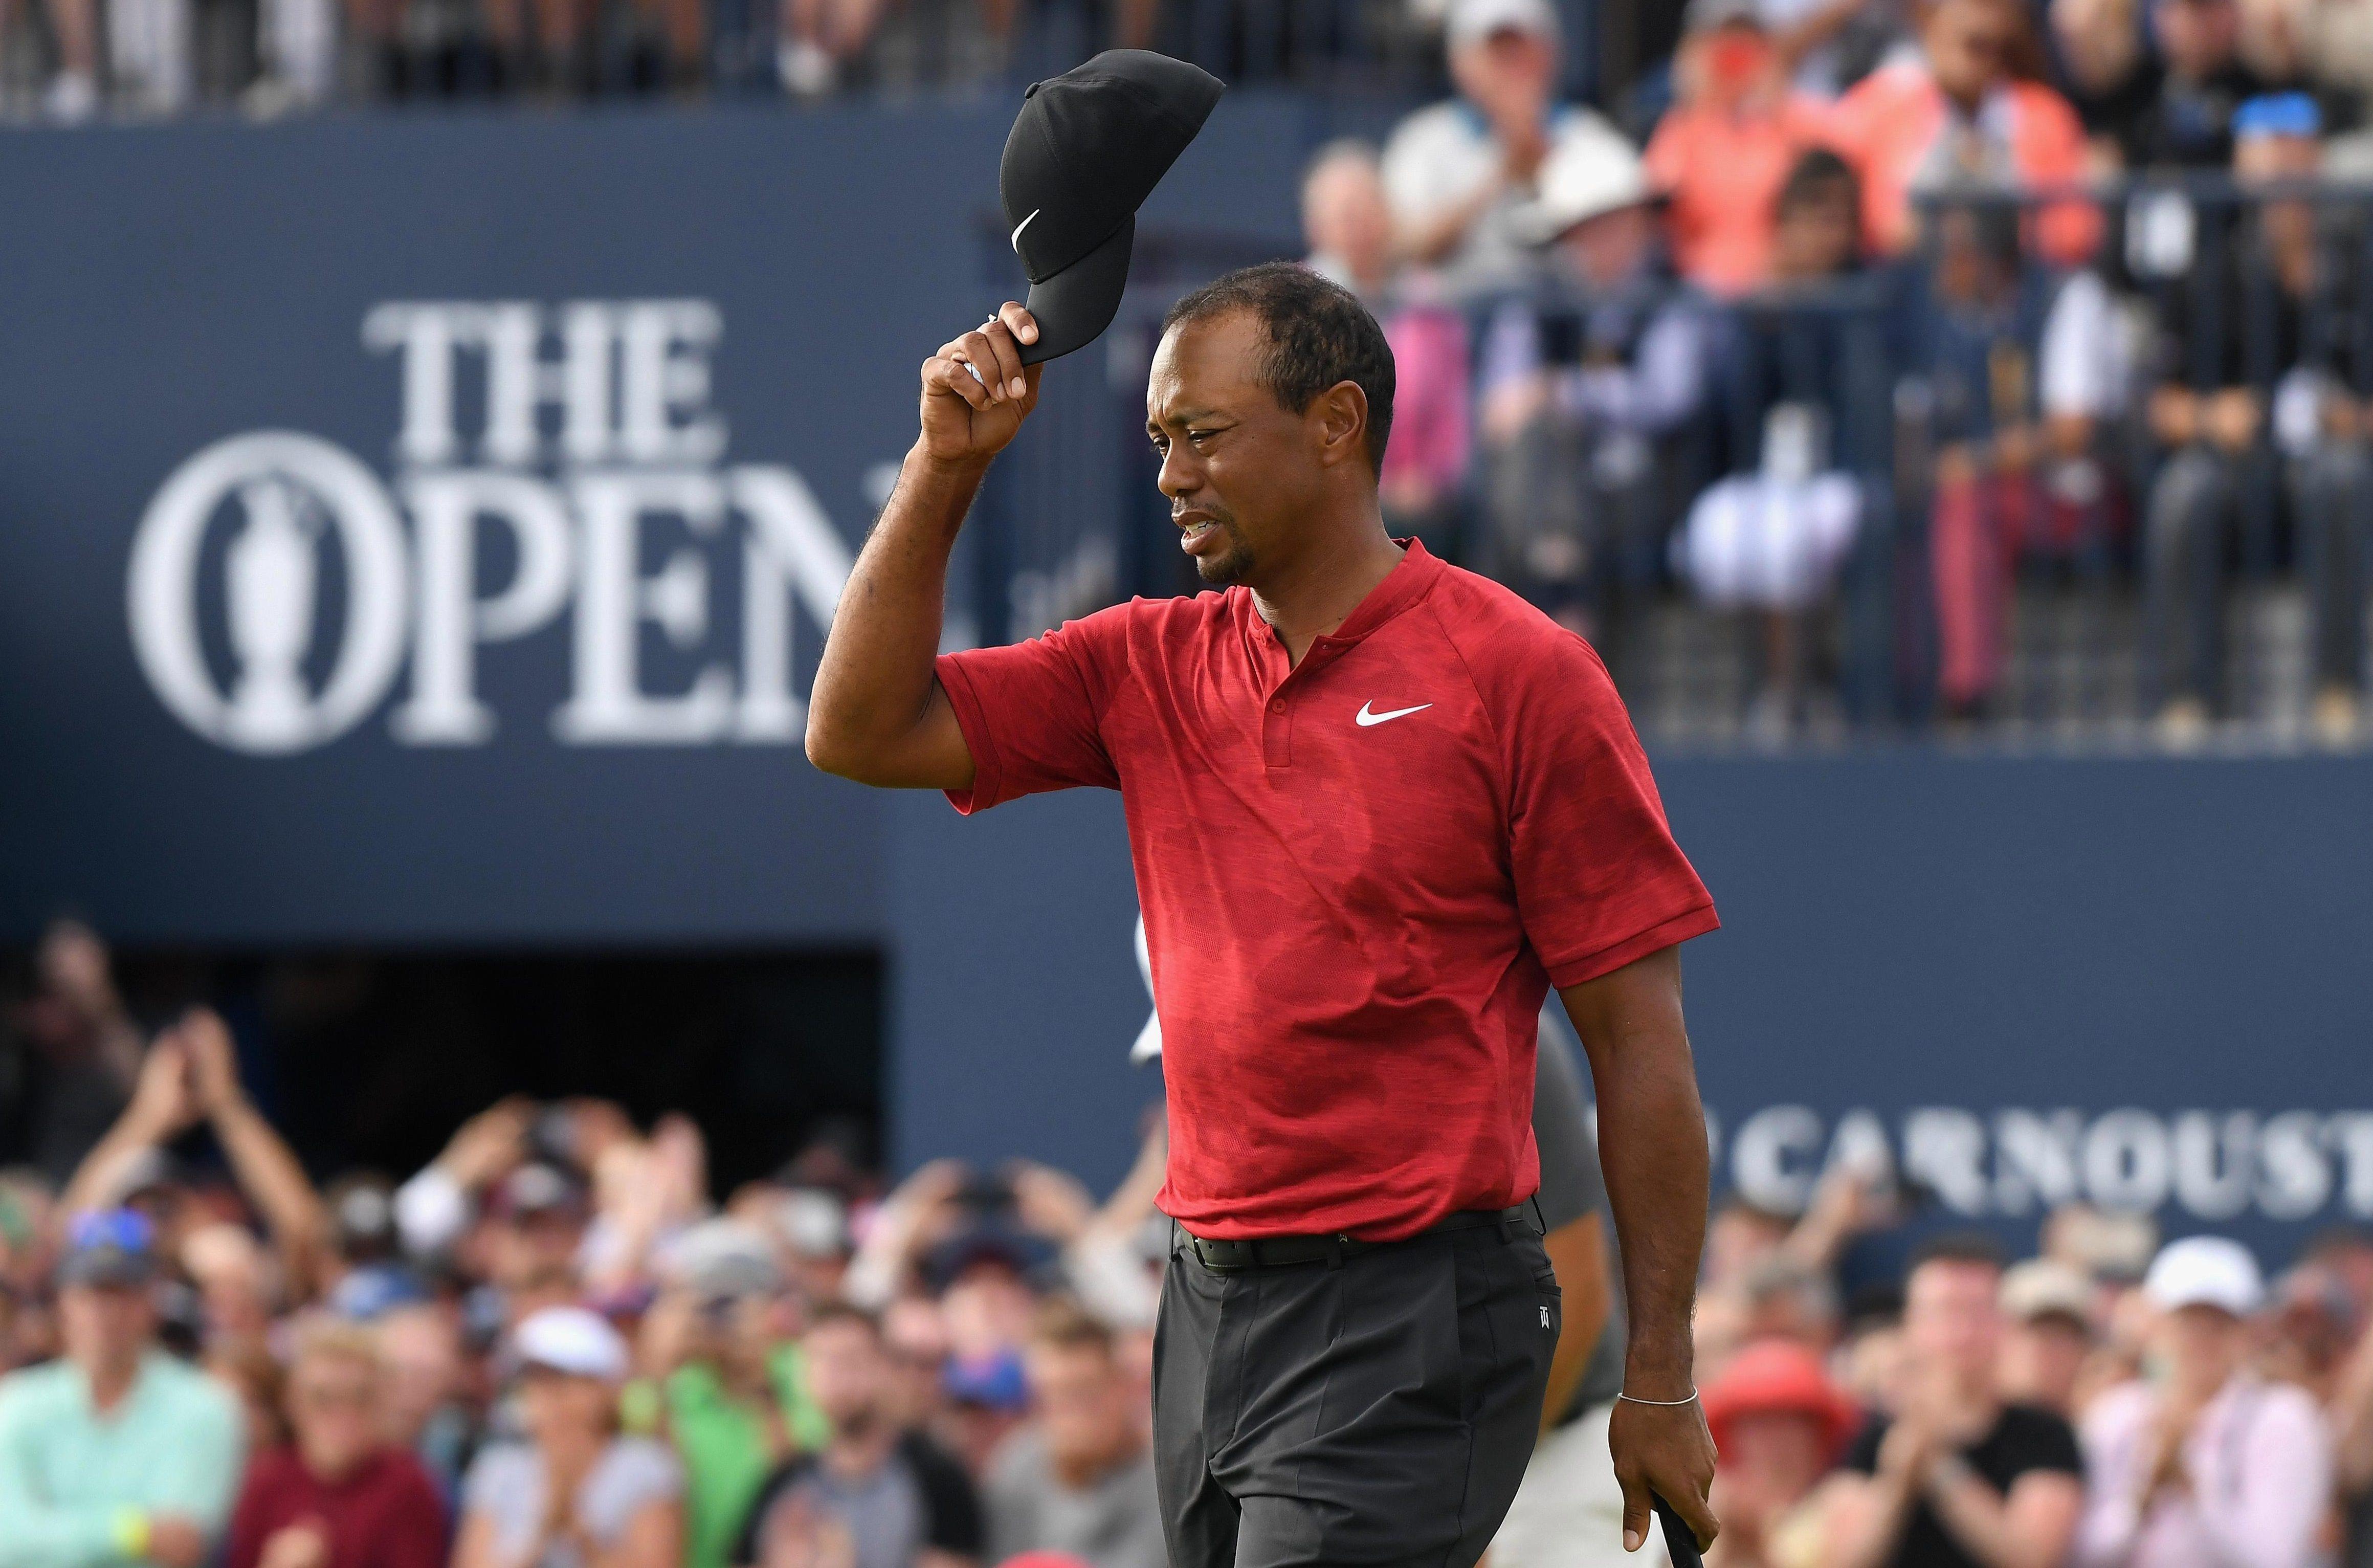 Woods was again denied a first Major triumph since 2008